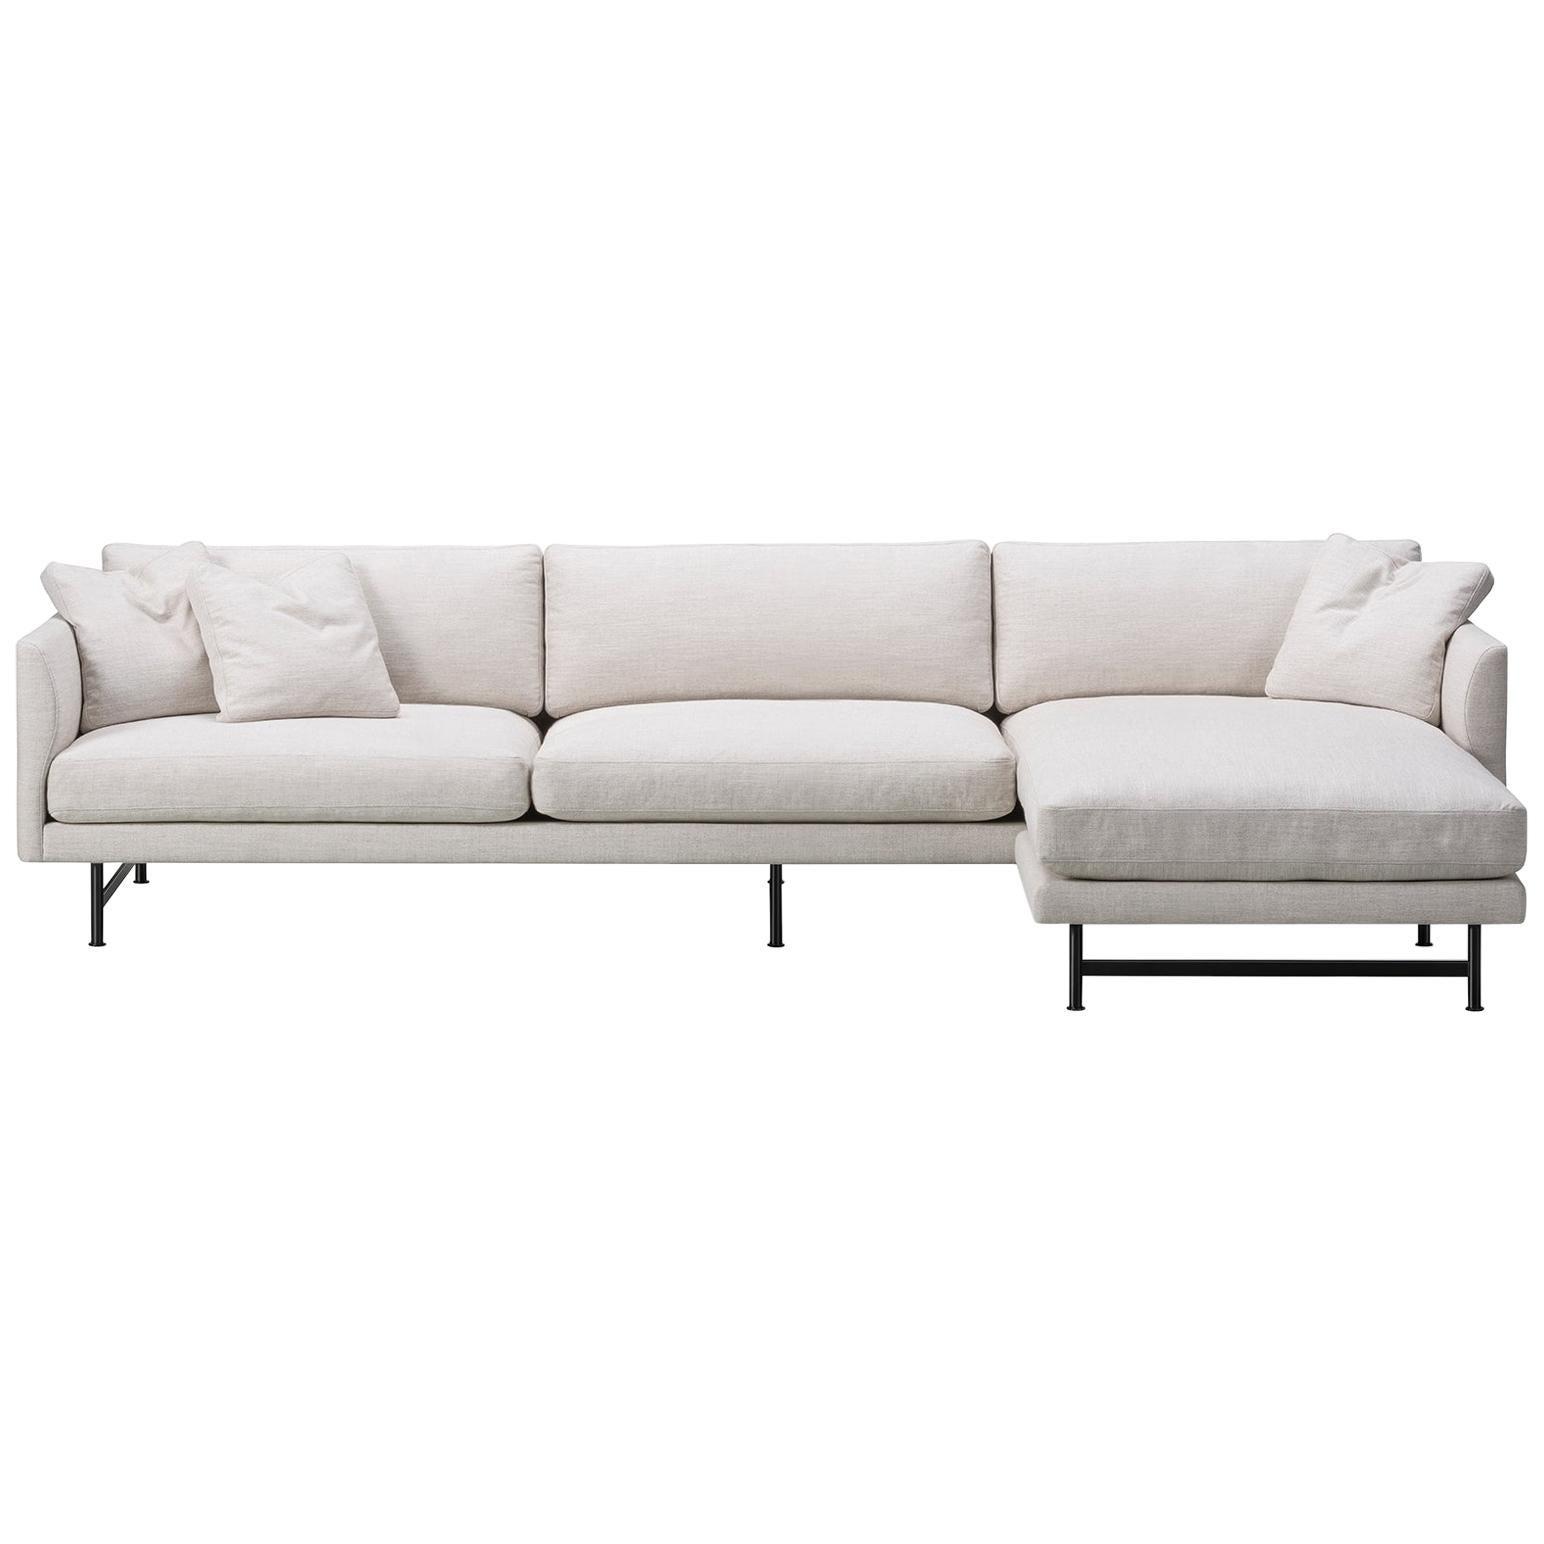 Hugo Passos Calmo Sofa 95, 3-seater, Chaise, Metal Base